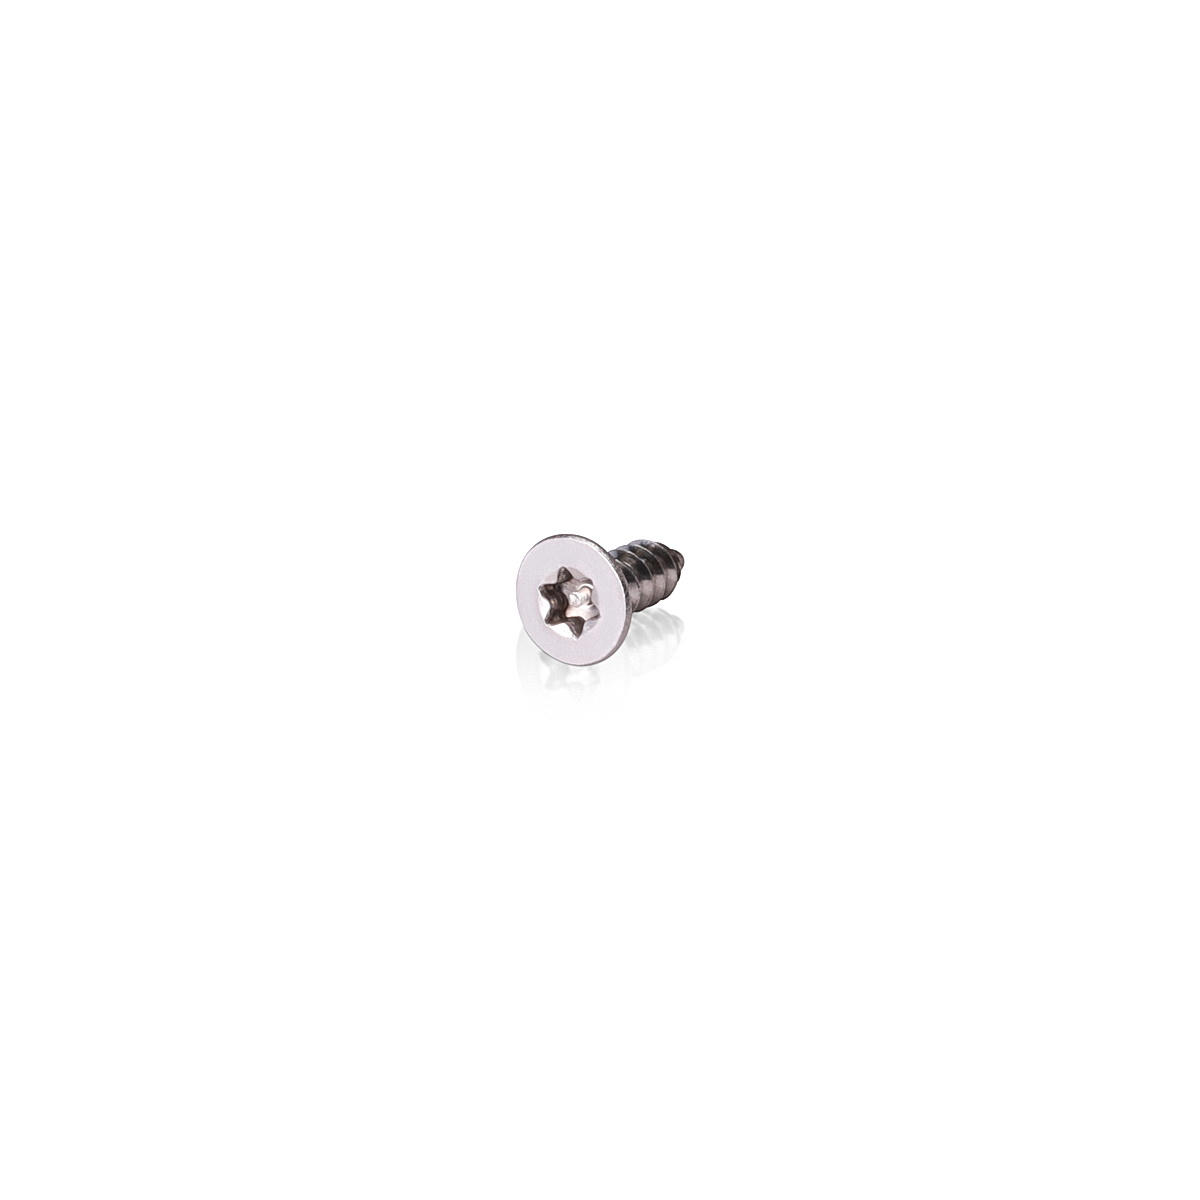 #8 x 1/2''   Torx   Flat Head   Sheet Metal Screws   Type: AB   Stainless Steel 18-8